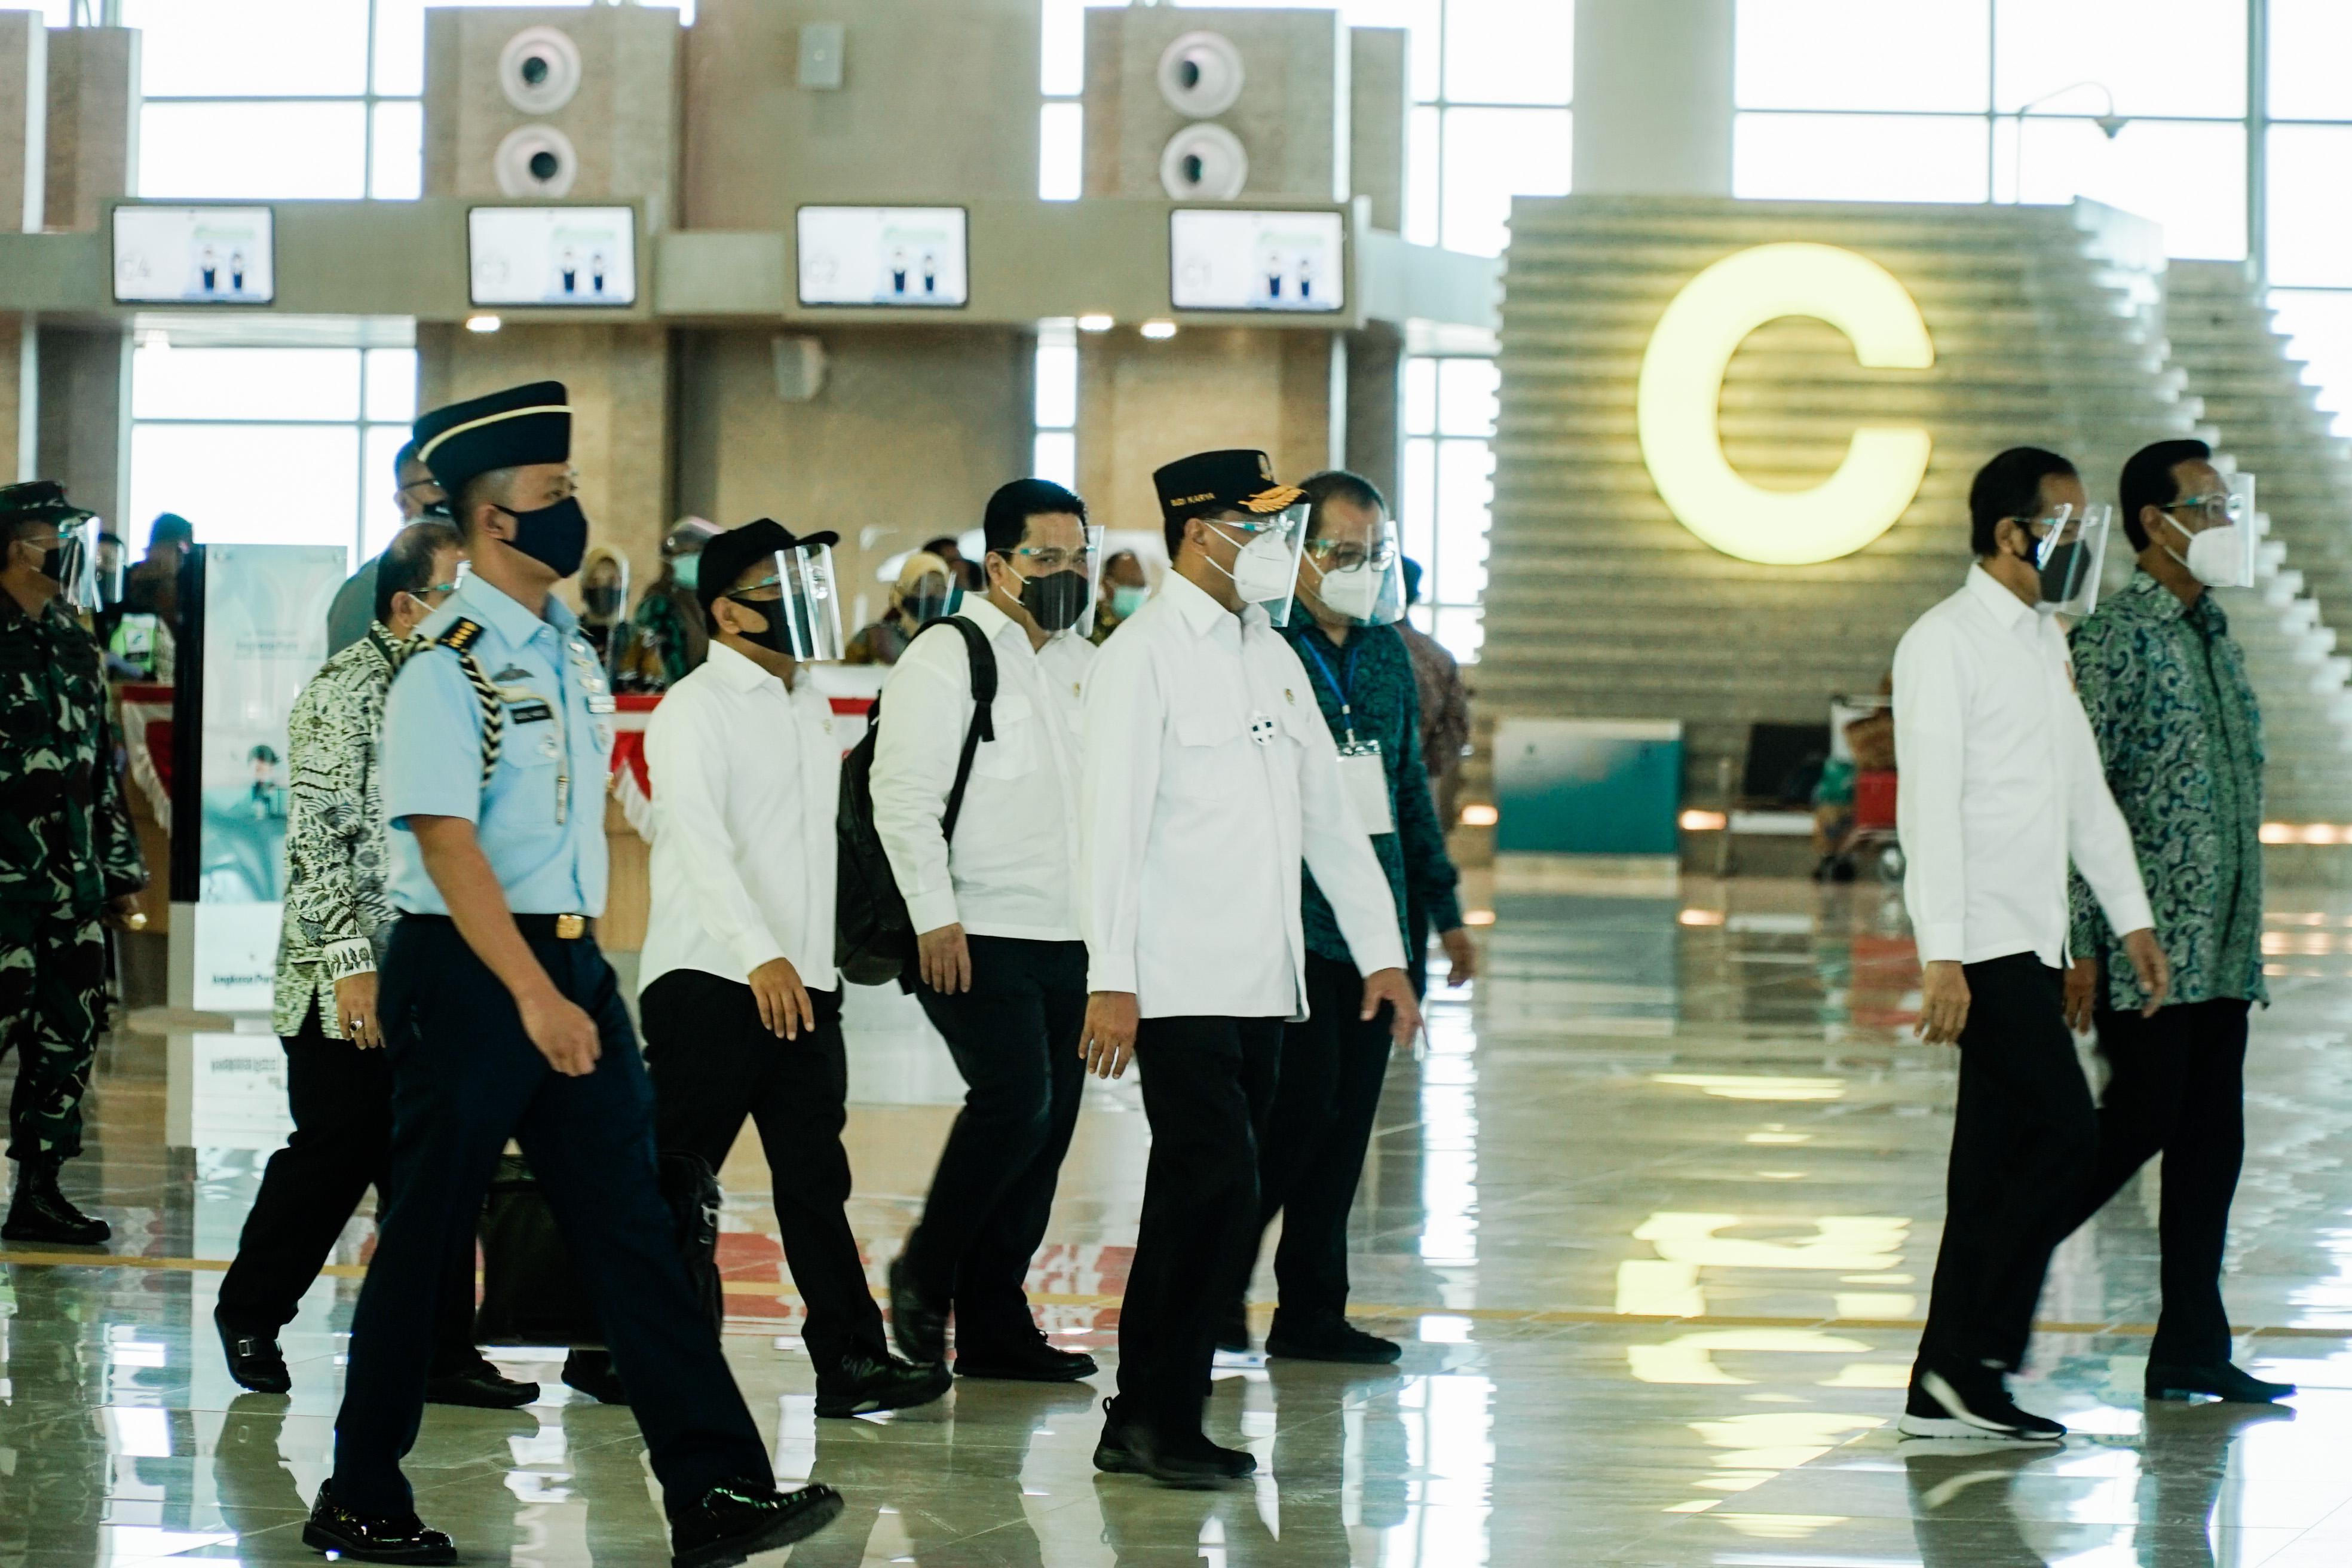 Presiden Joko Widodo hari ini, Jumat (28/8) meresmikan Yogyakarta International Airport (YIA) disertai dengan pengoperasian menara airnav Indonesia, dan sistem peringatan dini tsunami yang berada di kabupaten Kulon Progo.